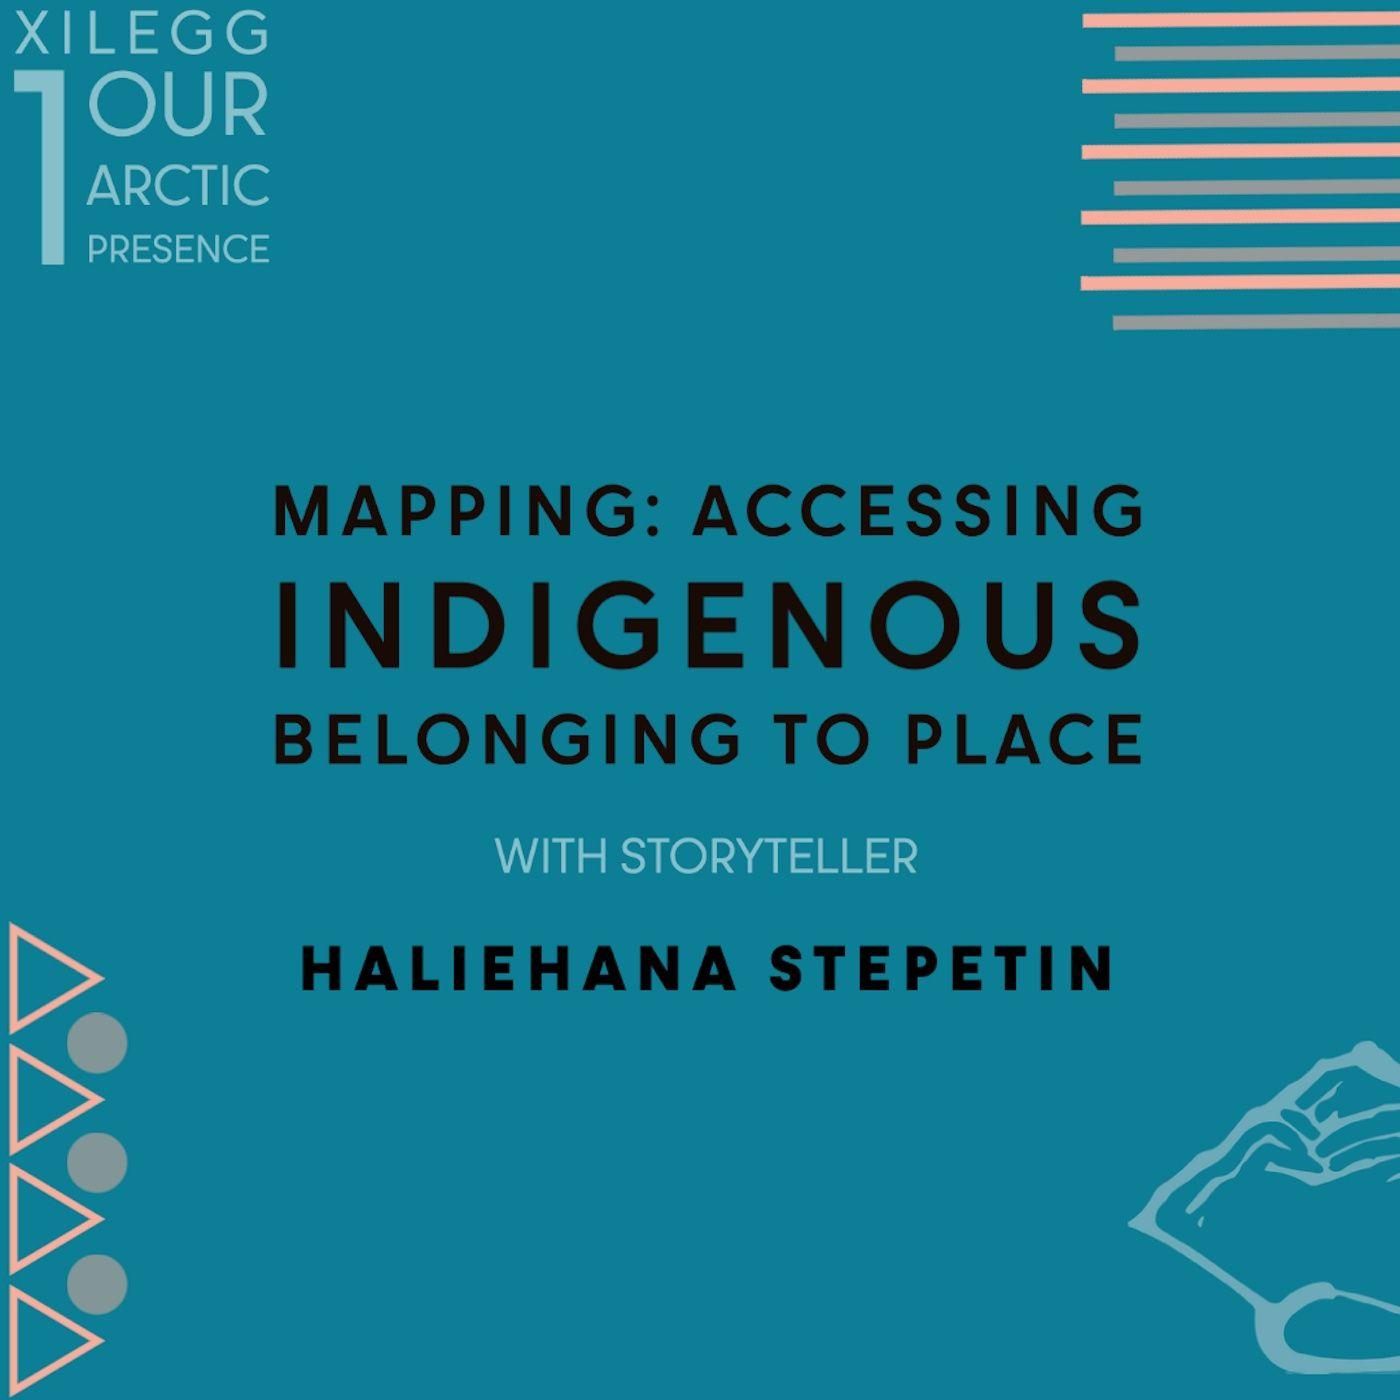 [Xilegg I] Mapping: Accessing Indigenous Belonging to Place w/ Haliehana Stepetin